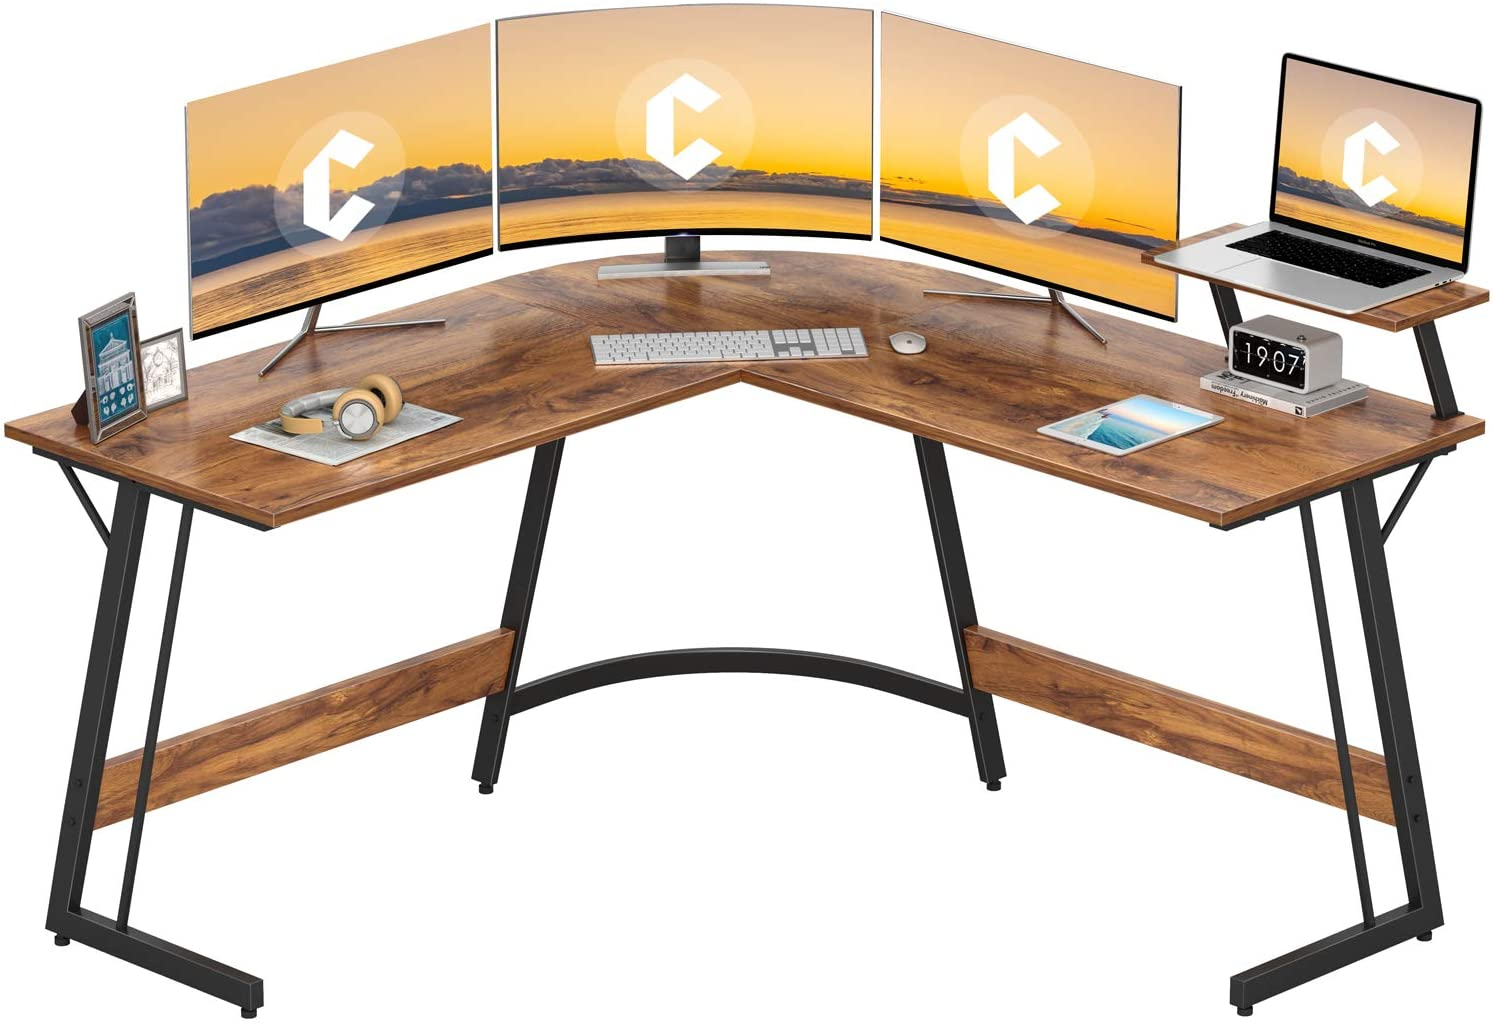 Cubiker L-shaped wood Gaming desk